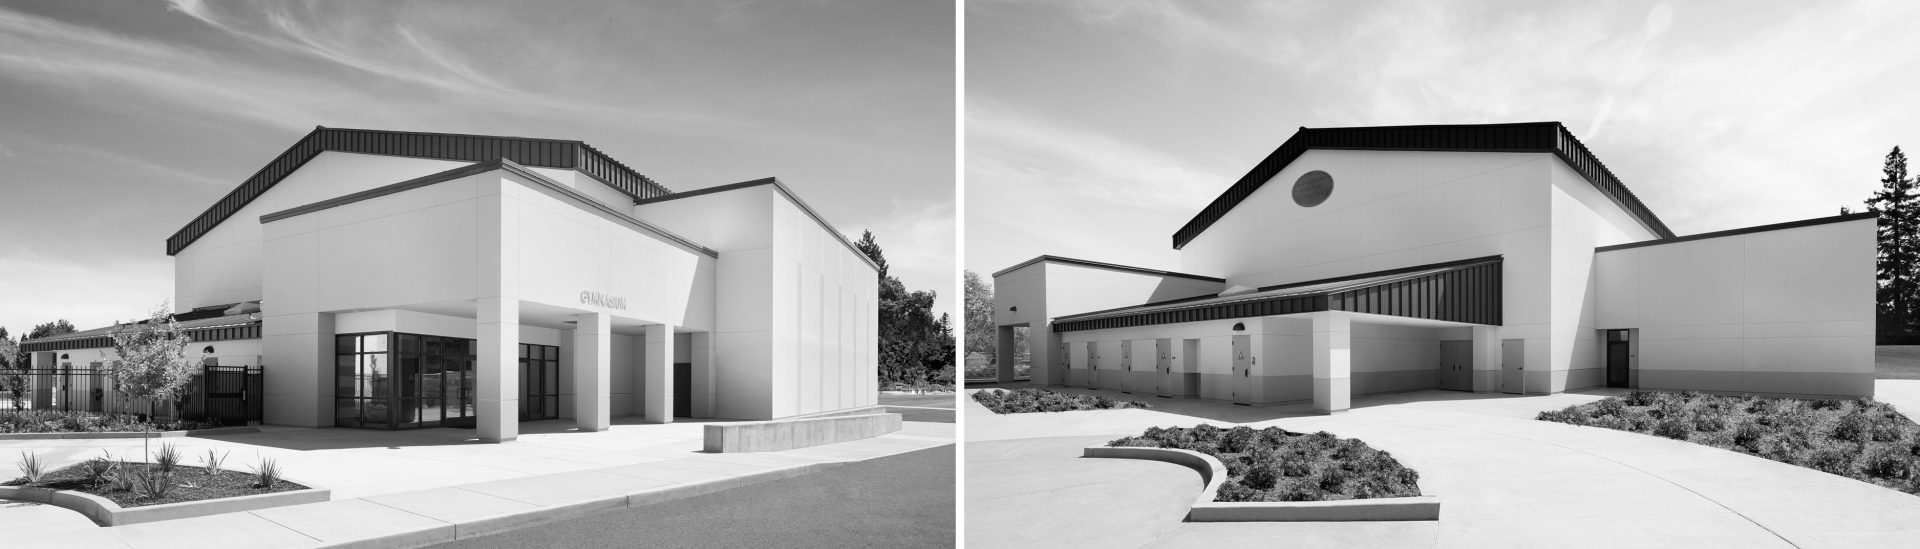 12 Months of Architecture: Standardization of Design Elements